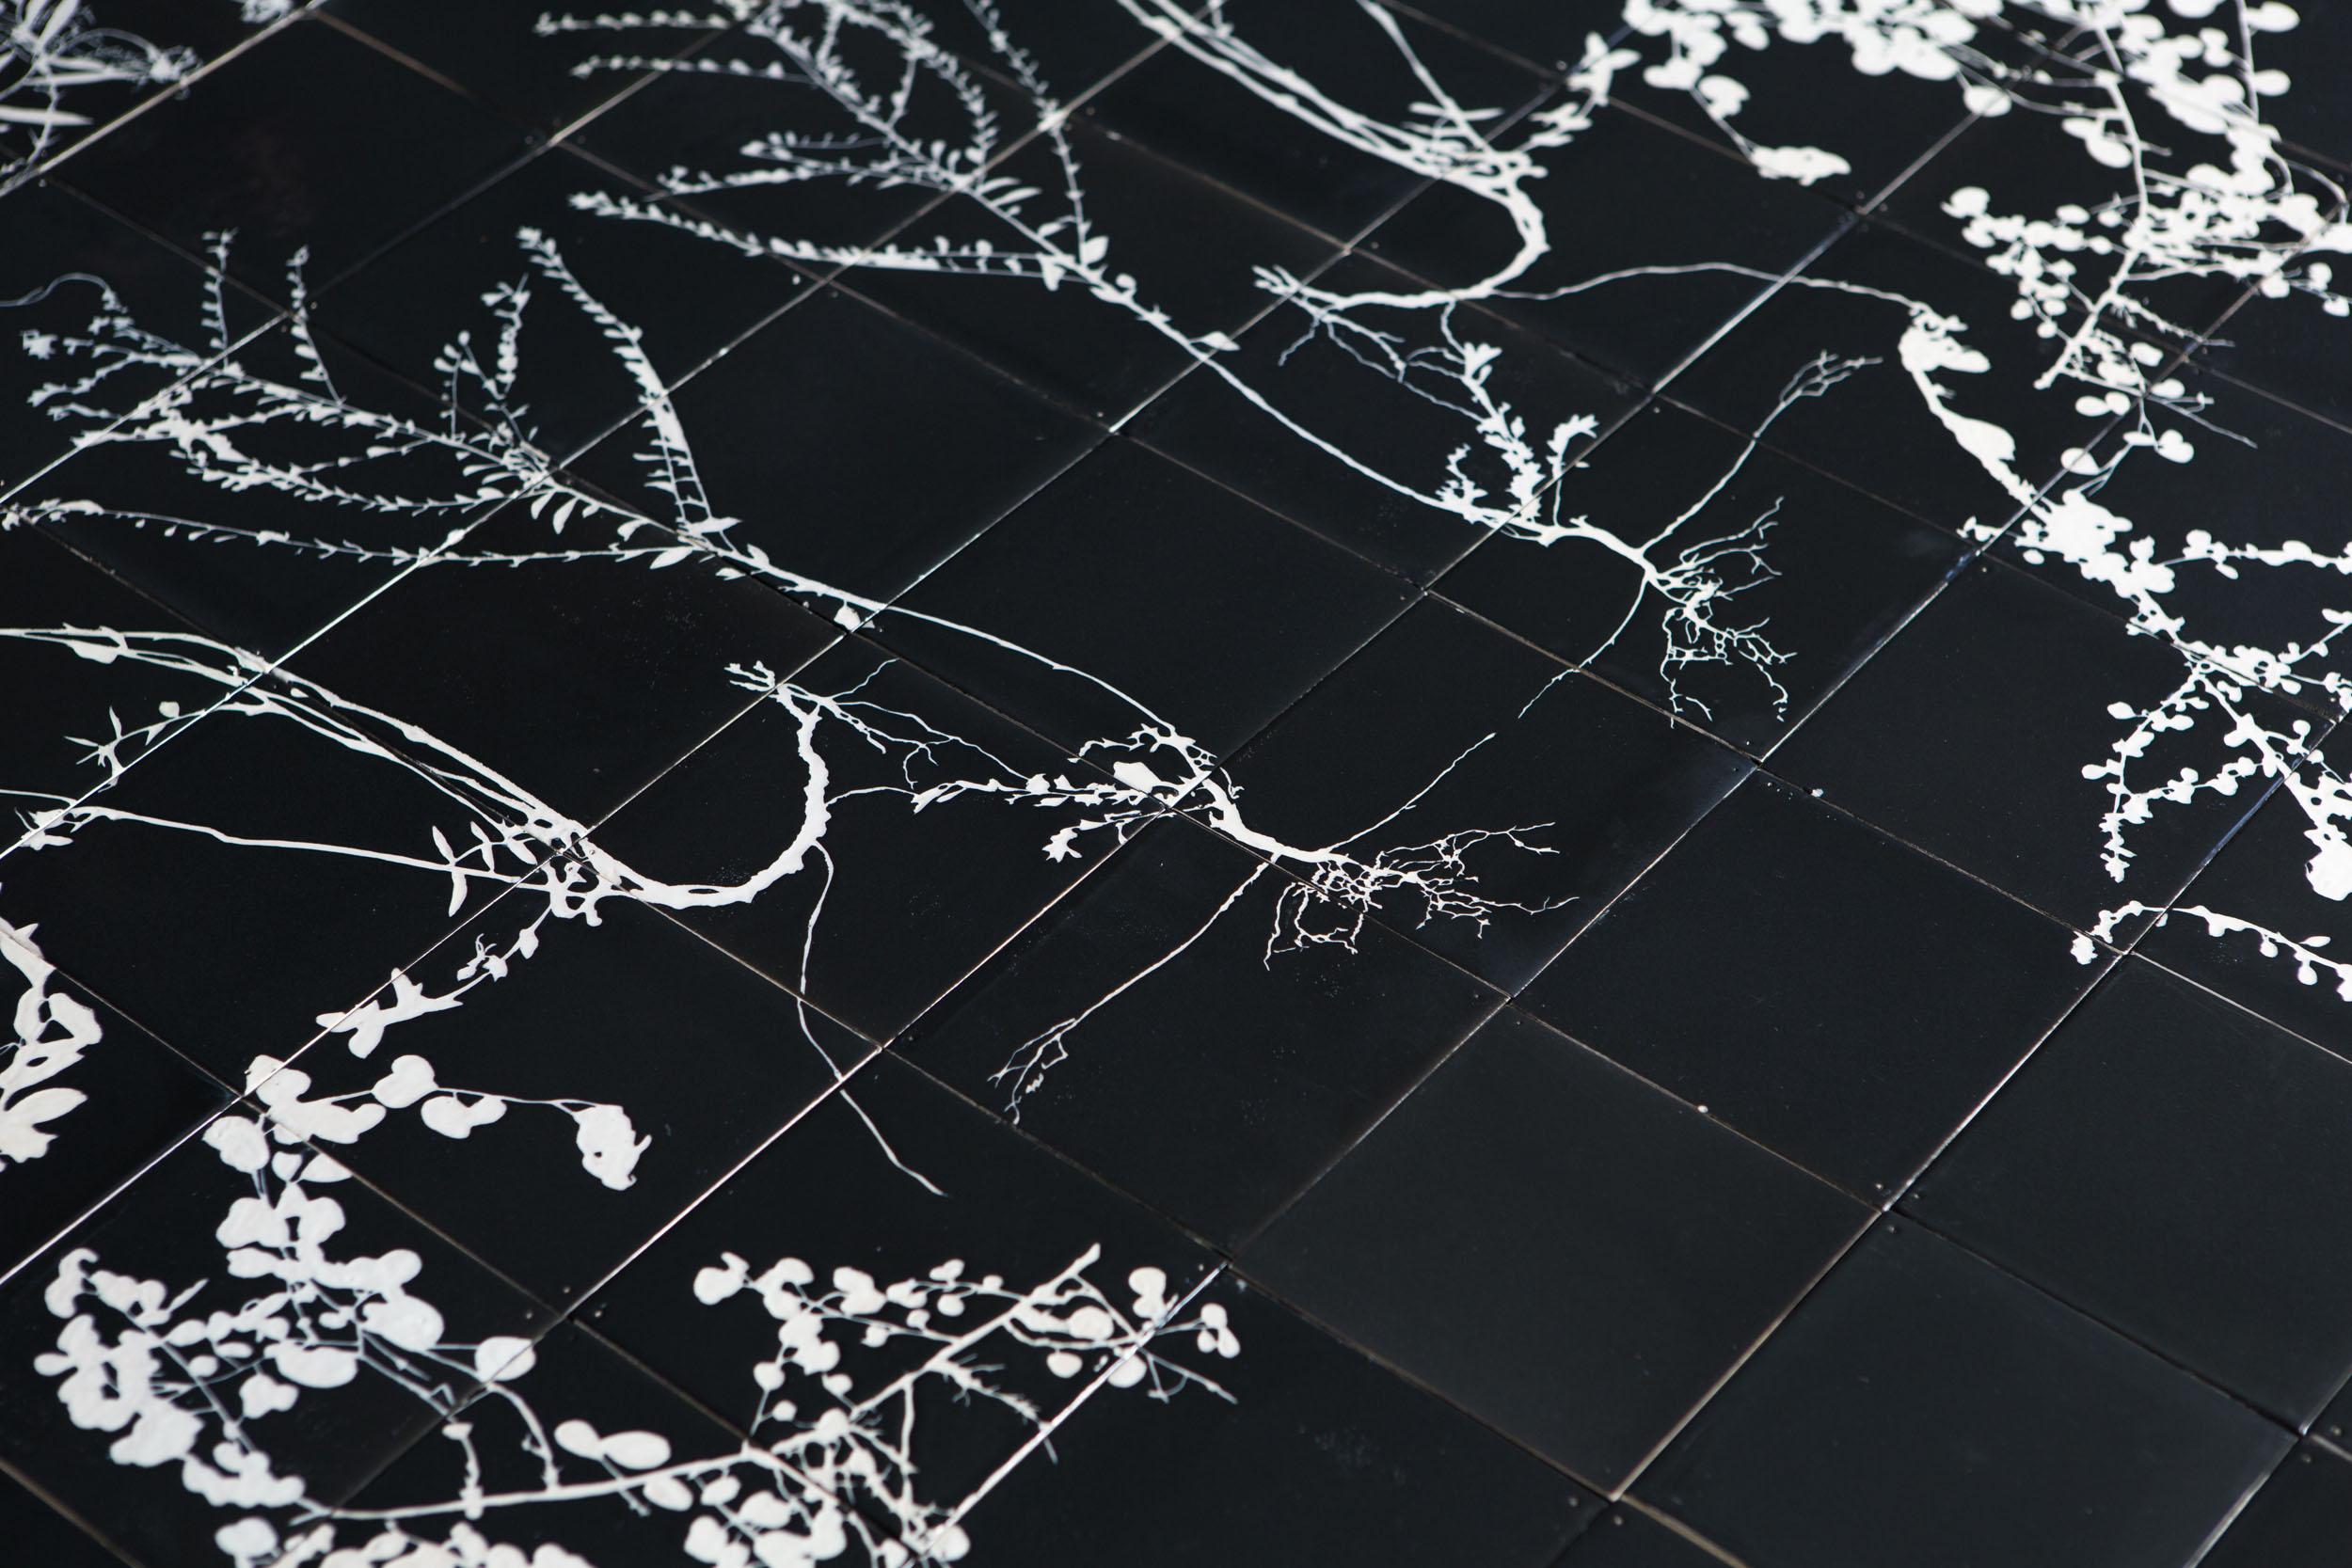 Details of Botanical Tile mural of weeds in black and white glaze